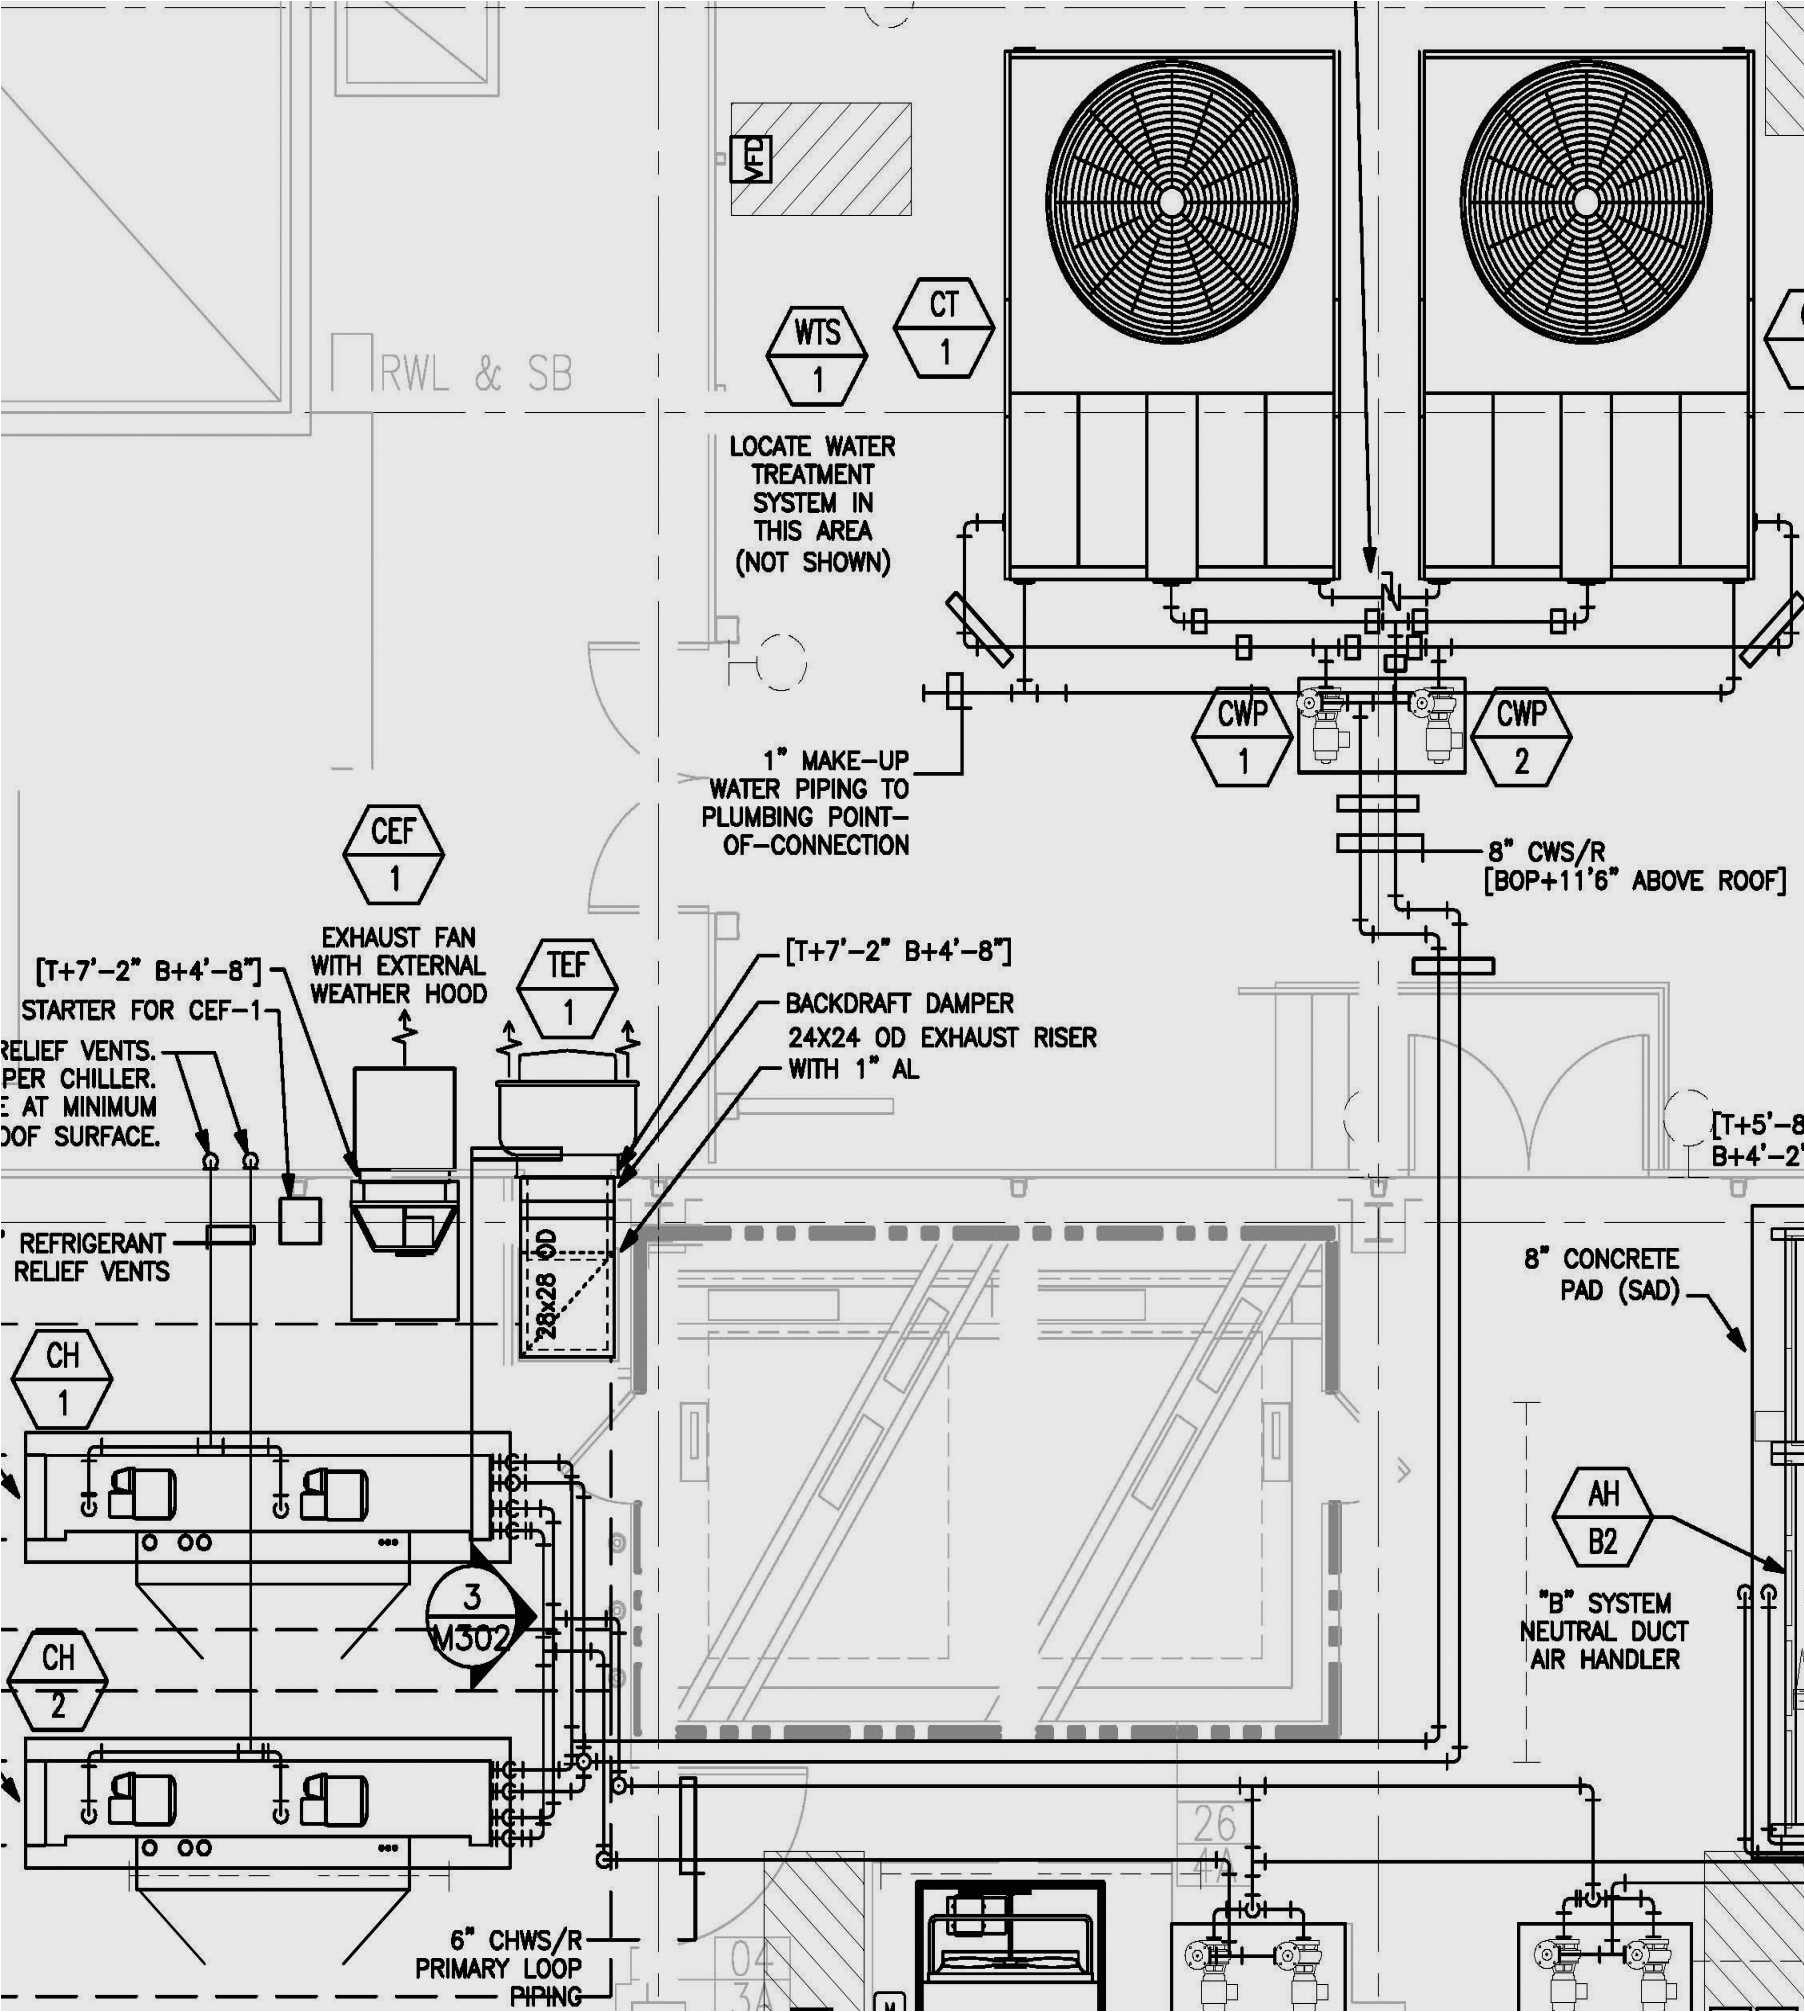 kawasaki klf 300 wiring diagram fisher cat pics fresh circuit diagram examples unique schematic examples 0d 1d and 3d